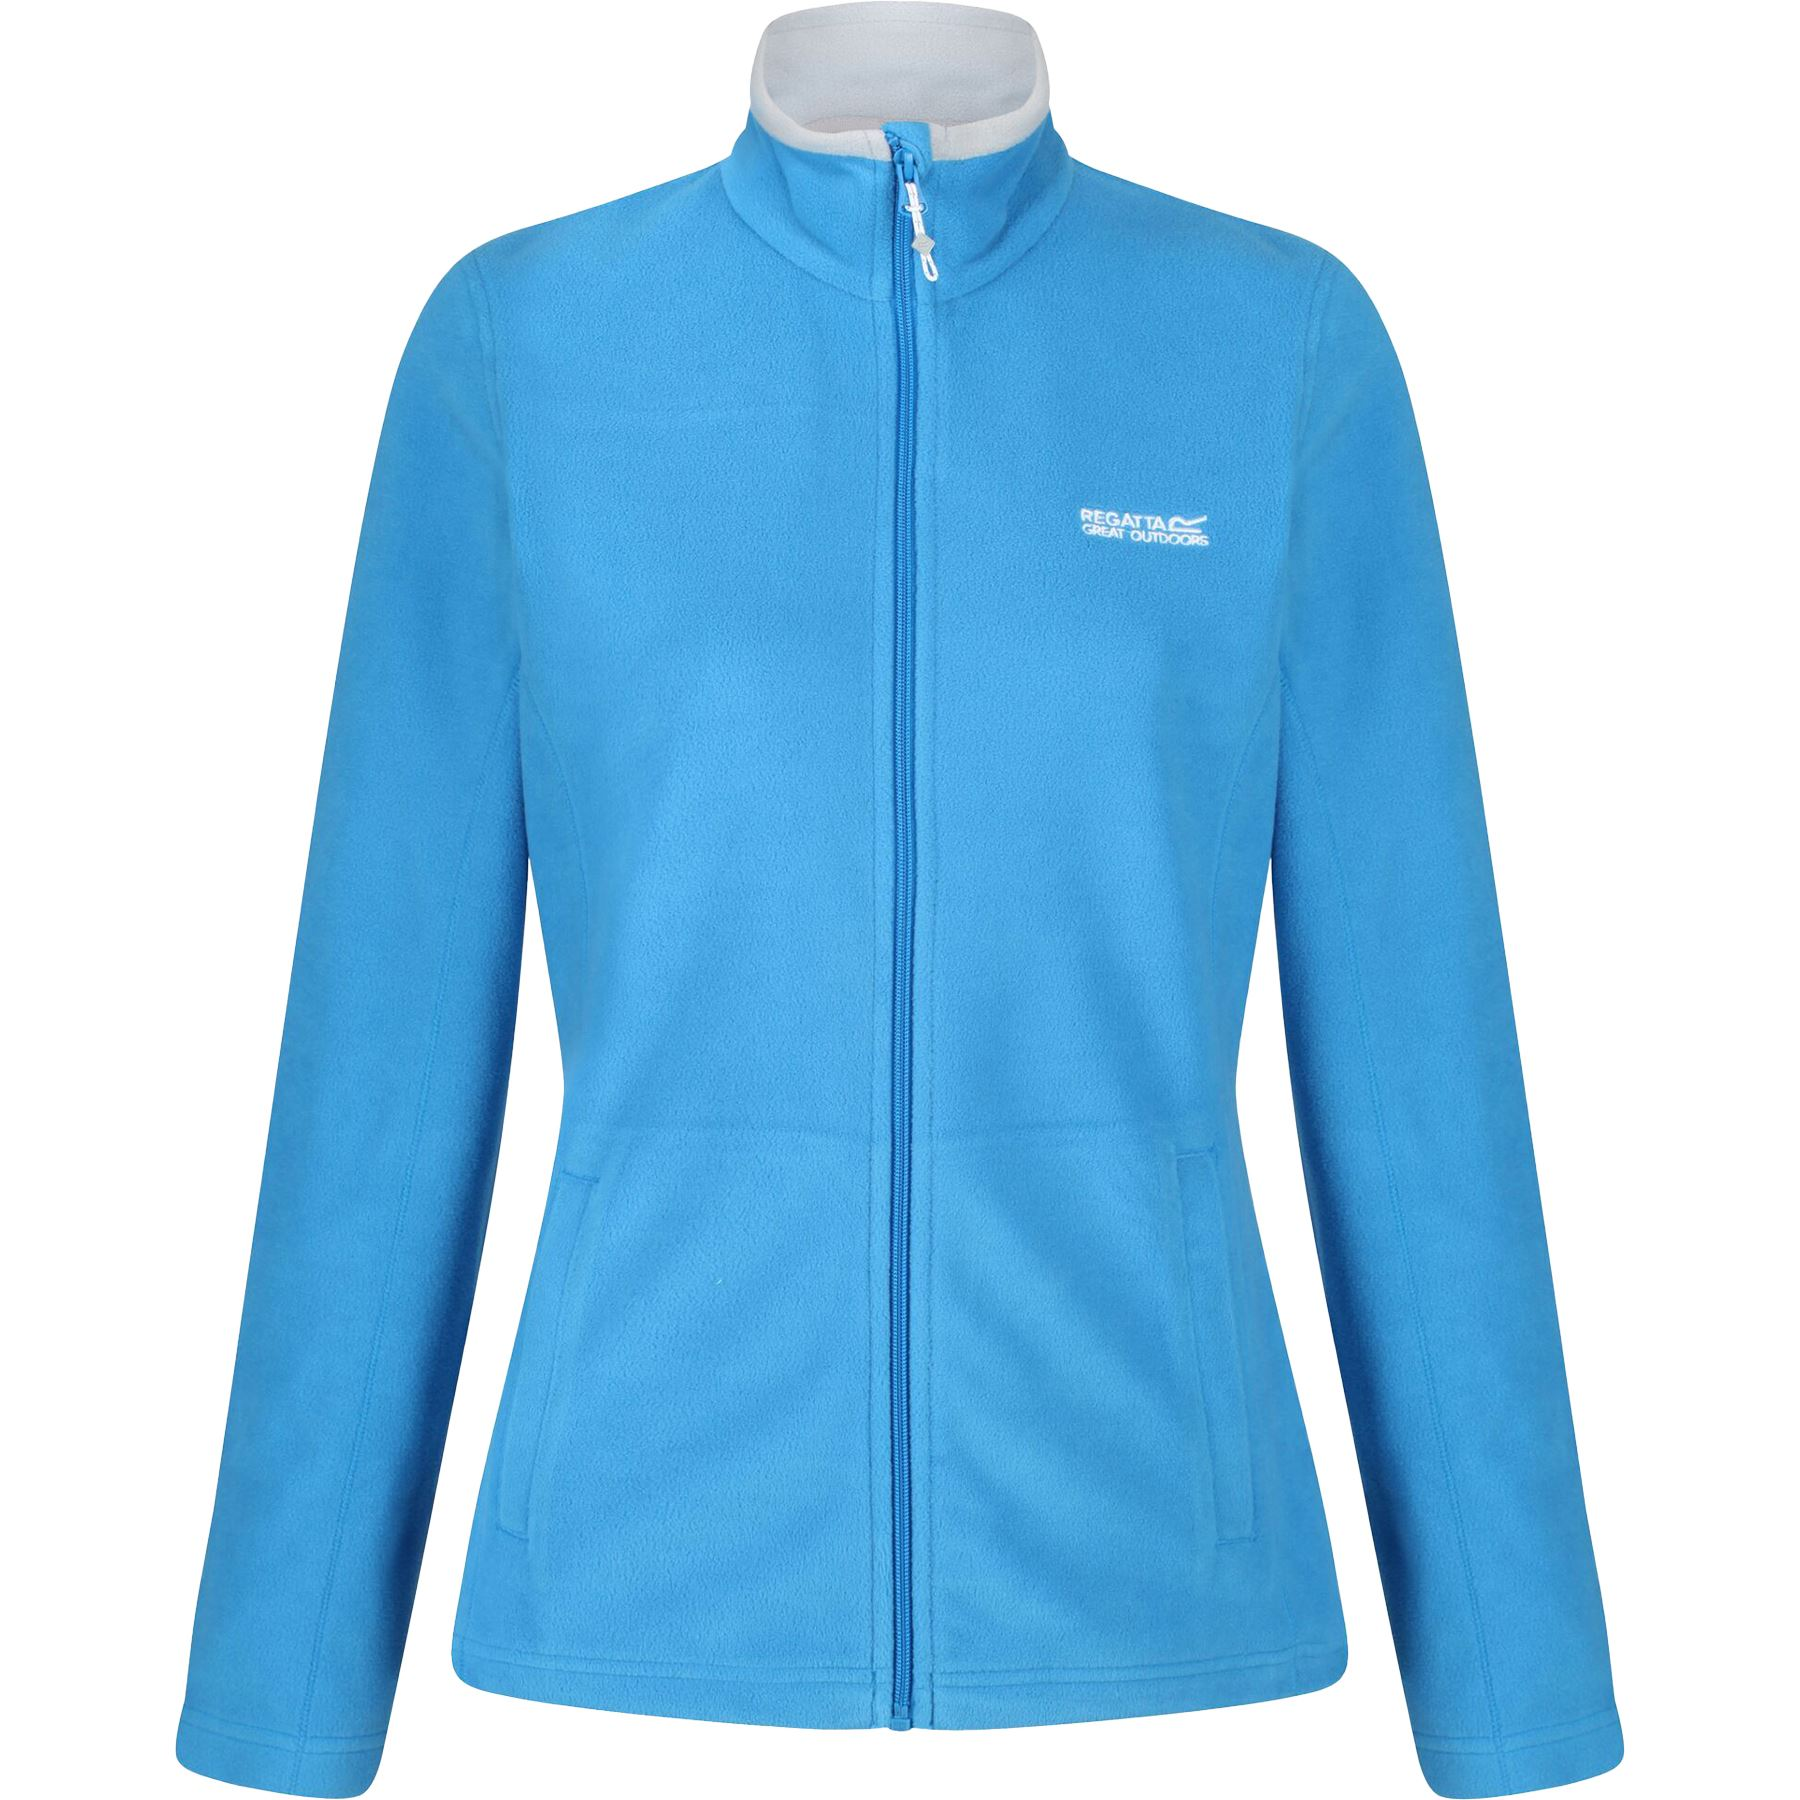 New Regatta Ladies Womens Micro Full Zip Fleece Top Anti Pill Winter Jacket 6-20